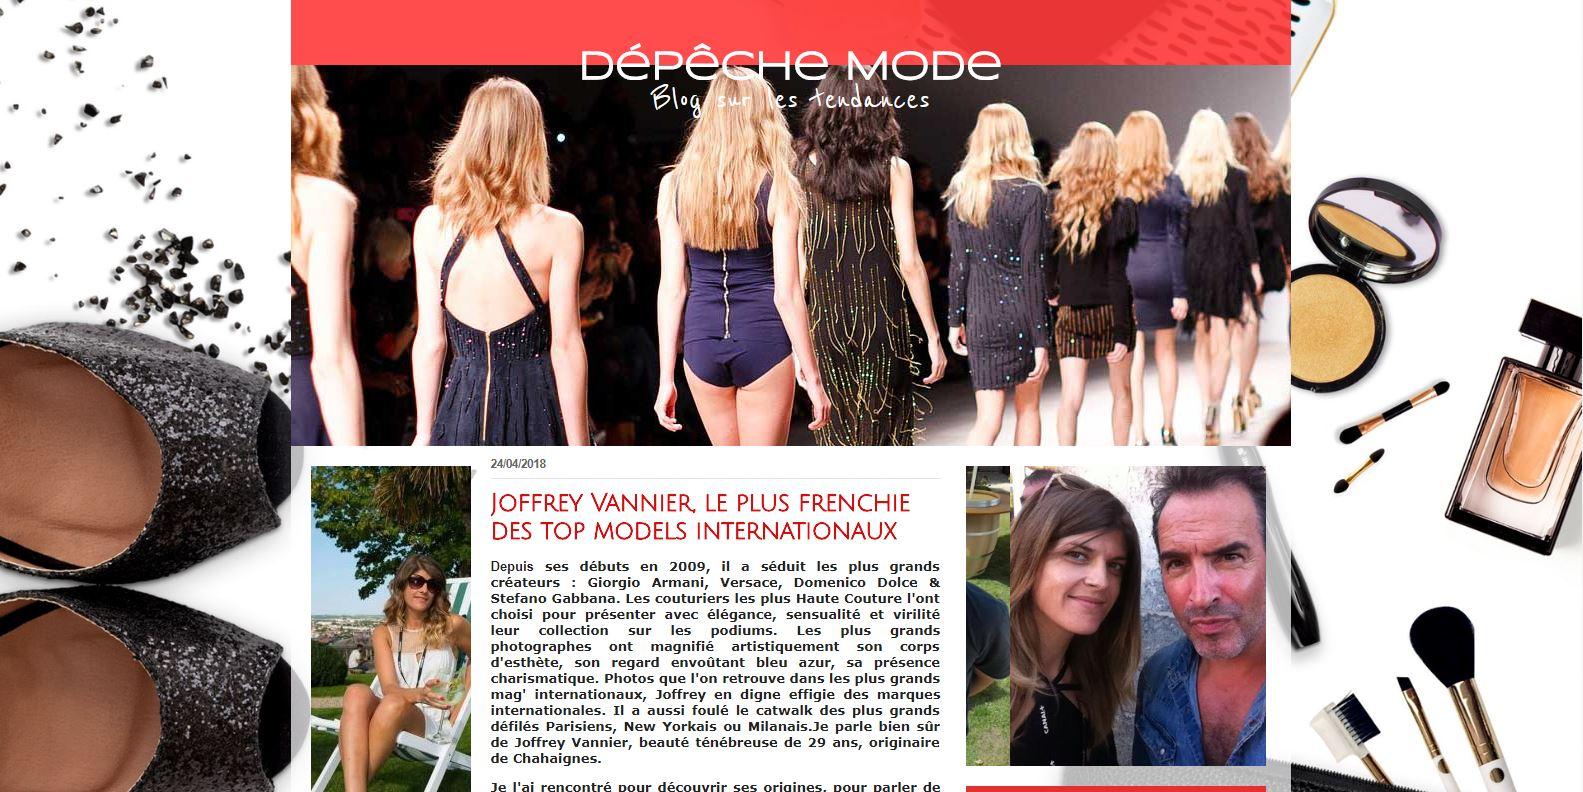 blog-aurelie-texier-depechemode-charentelibre-jadgarden-creation-site-web-charente-angouleme-mode-beaute-cinema